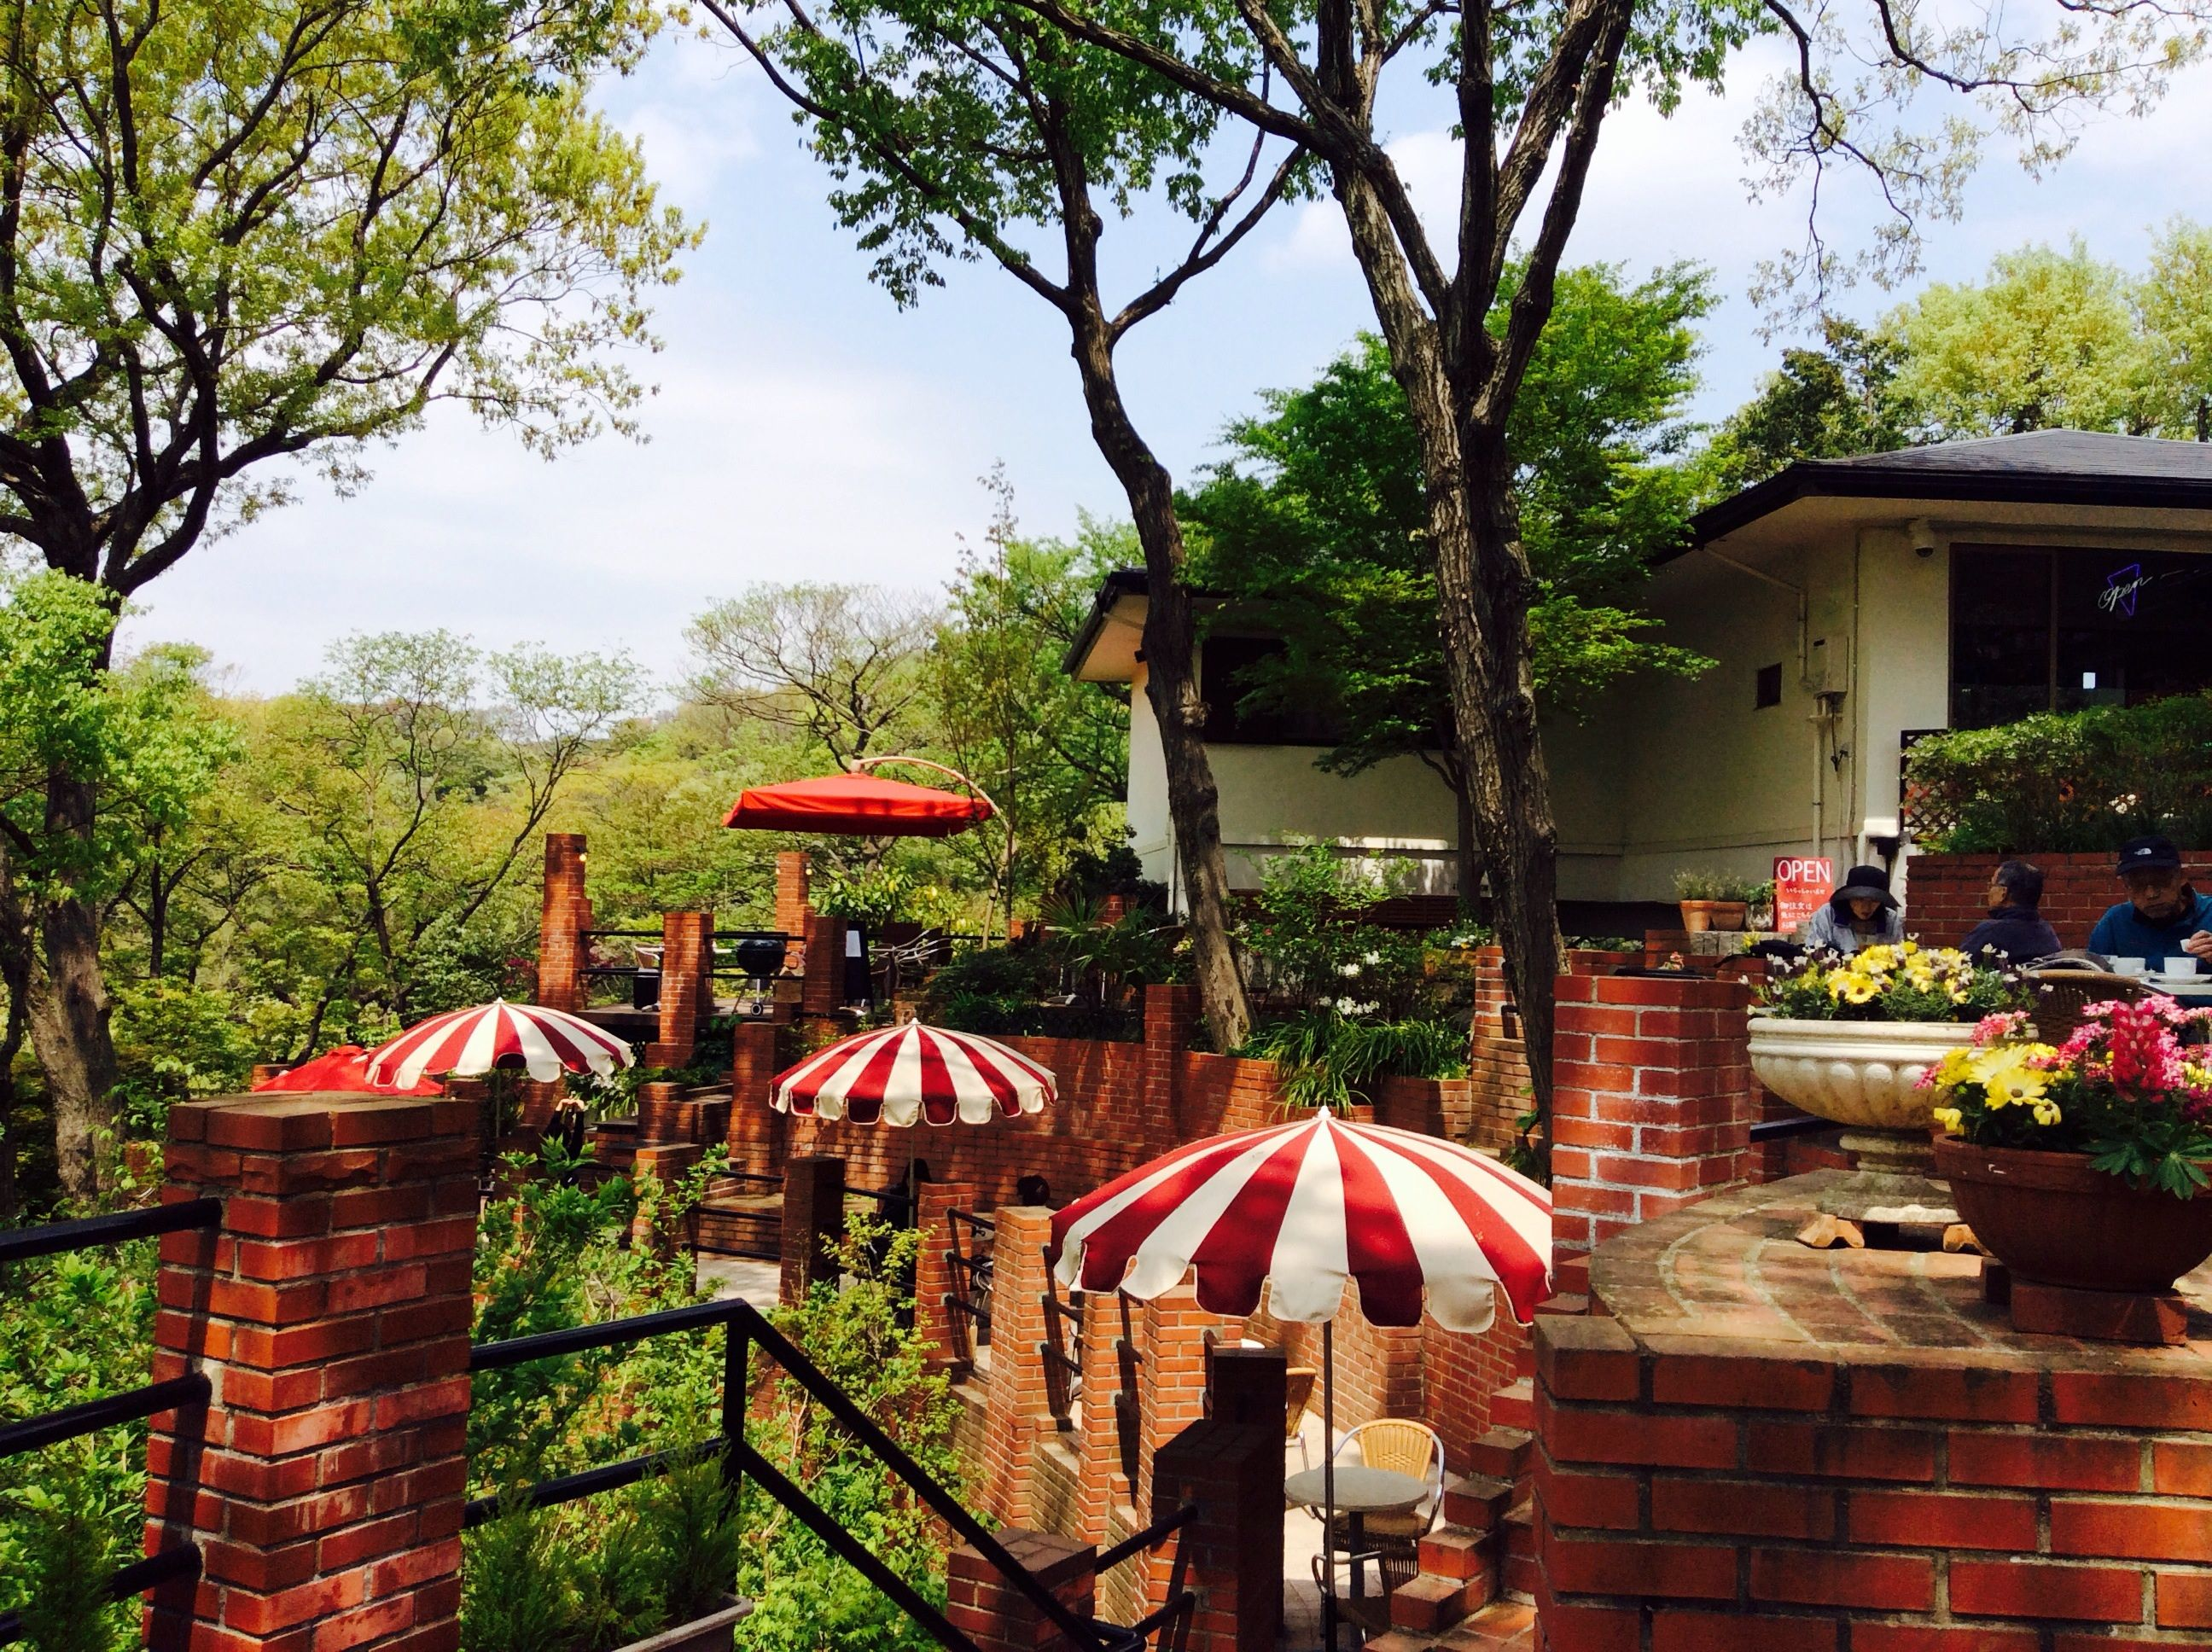 【KAMAKURA】鎌倉大仏のその先へ。天空のカフェ「樹ガーデン」に行ってみよう | MATCHA - 訪日外国人観光客向けWebマガジン